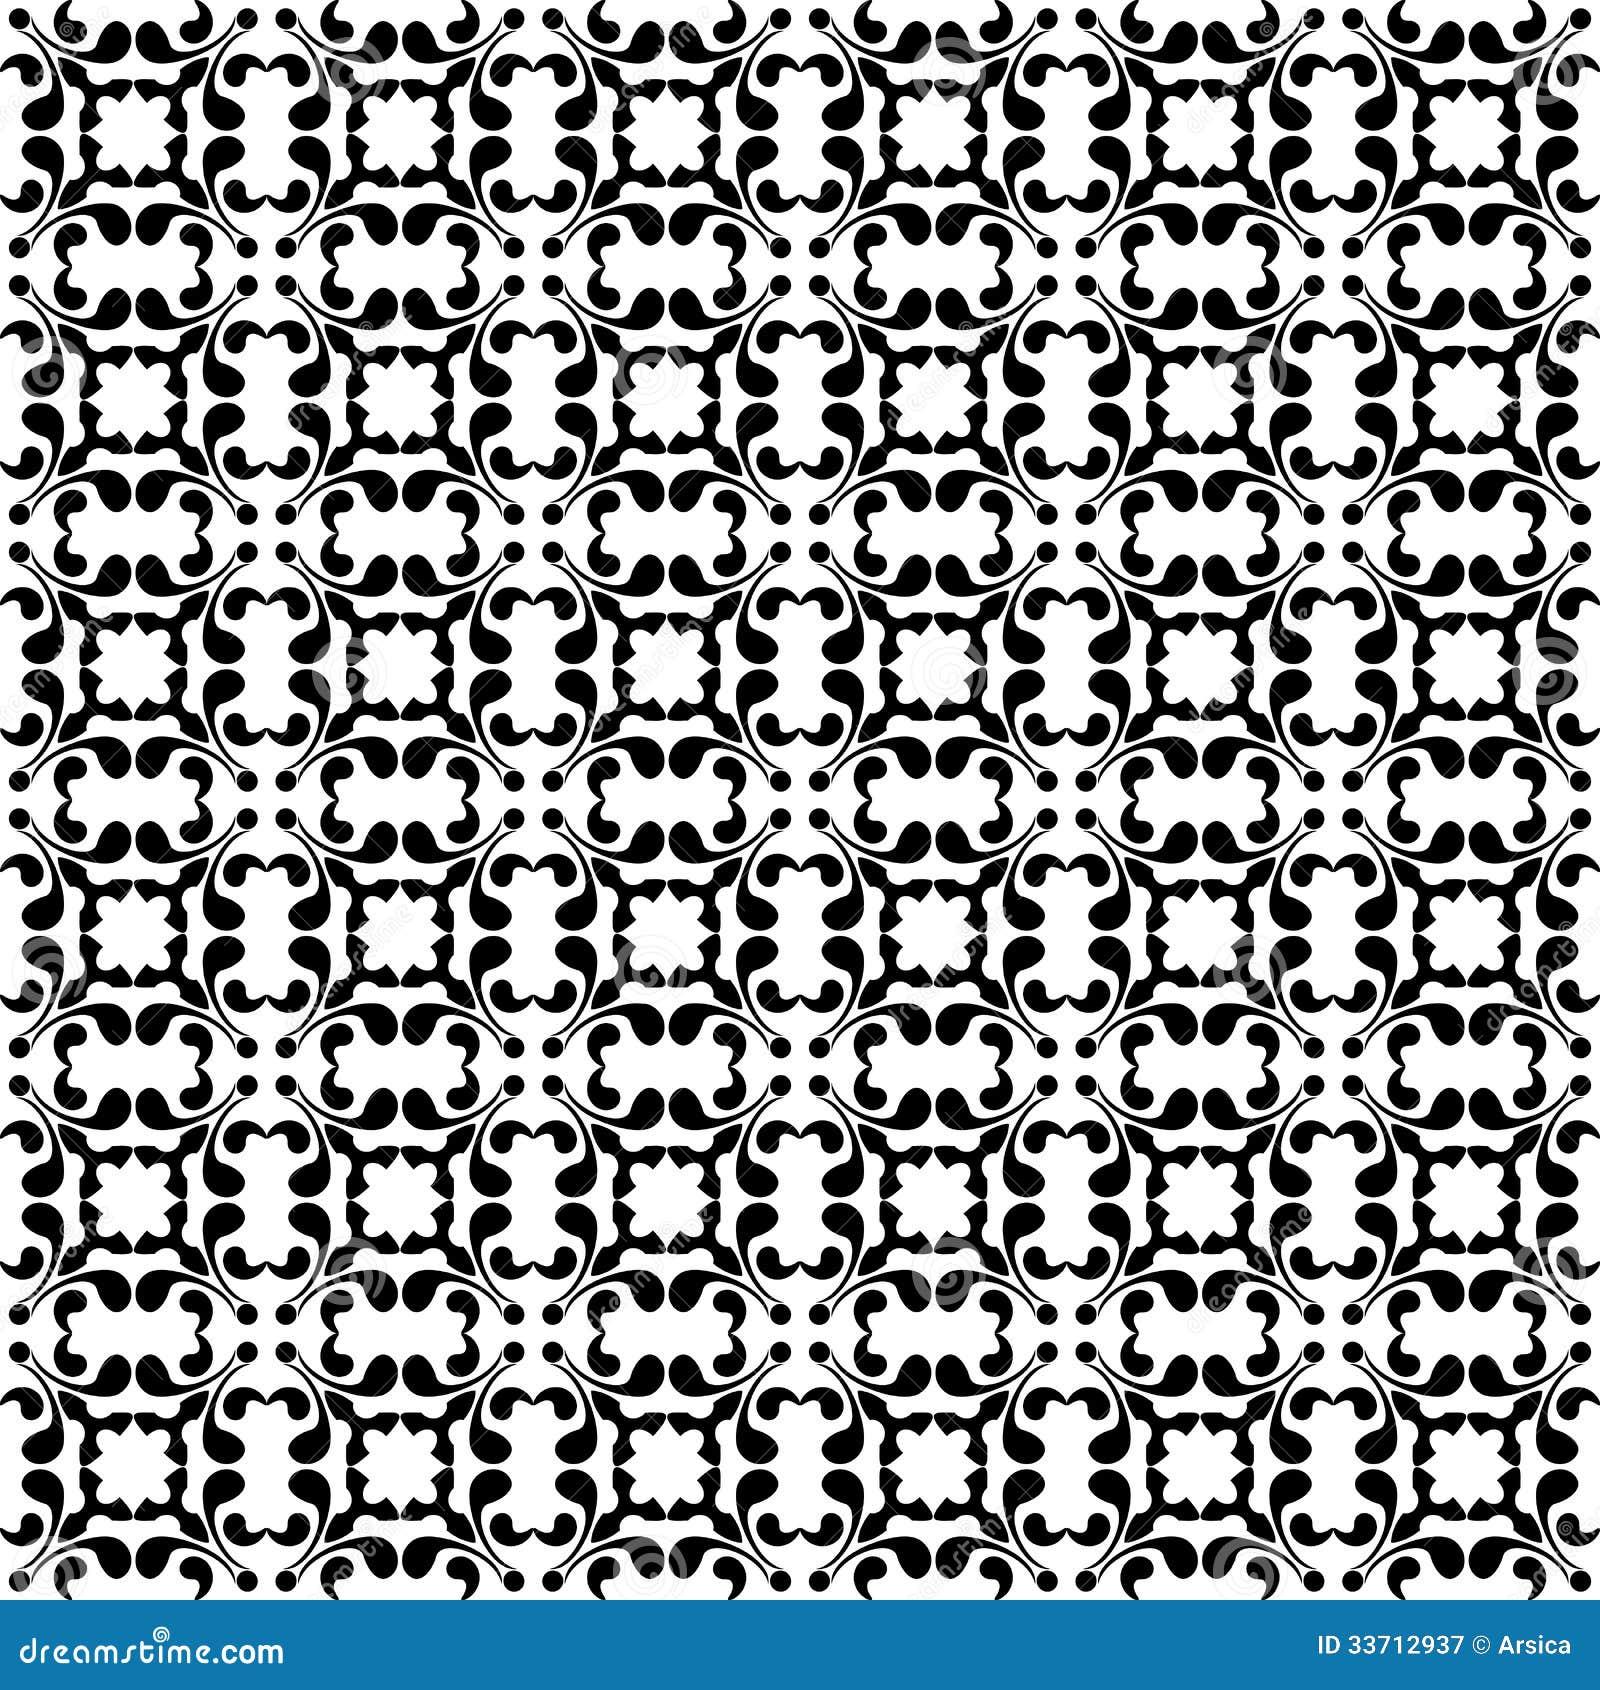 Papel pintado incons til floral blanco y negro fotograf a for Papel pintado blanco y negro